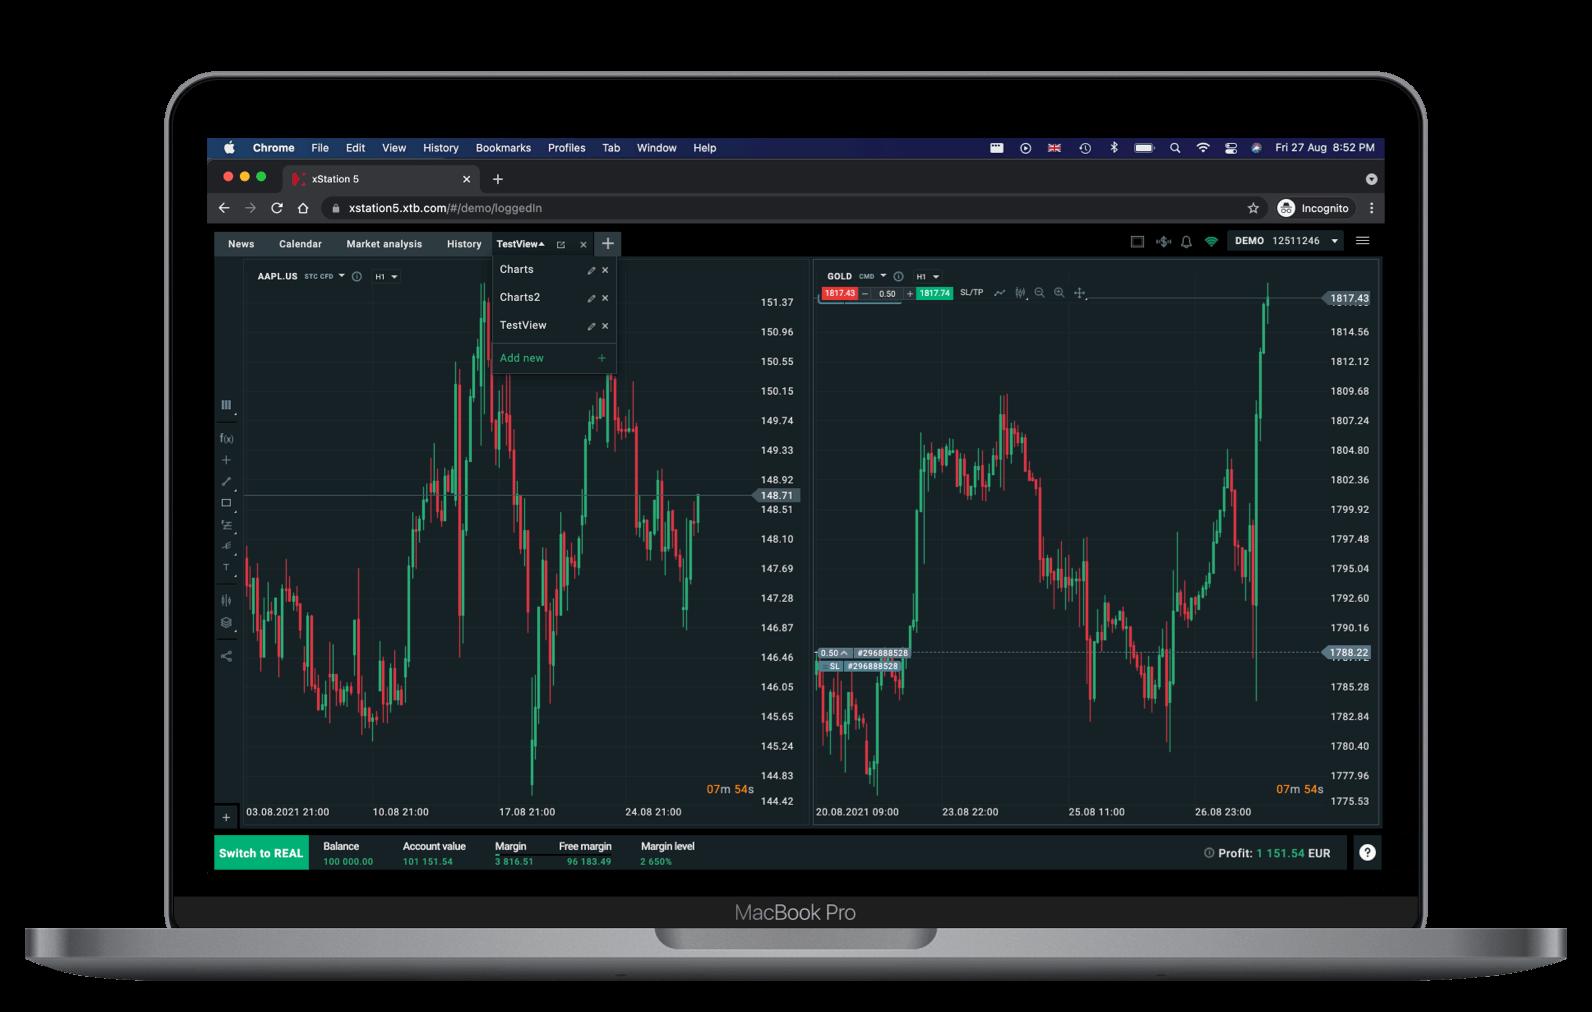 XTB Web Plattform Multichart